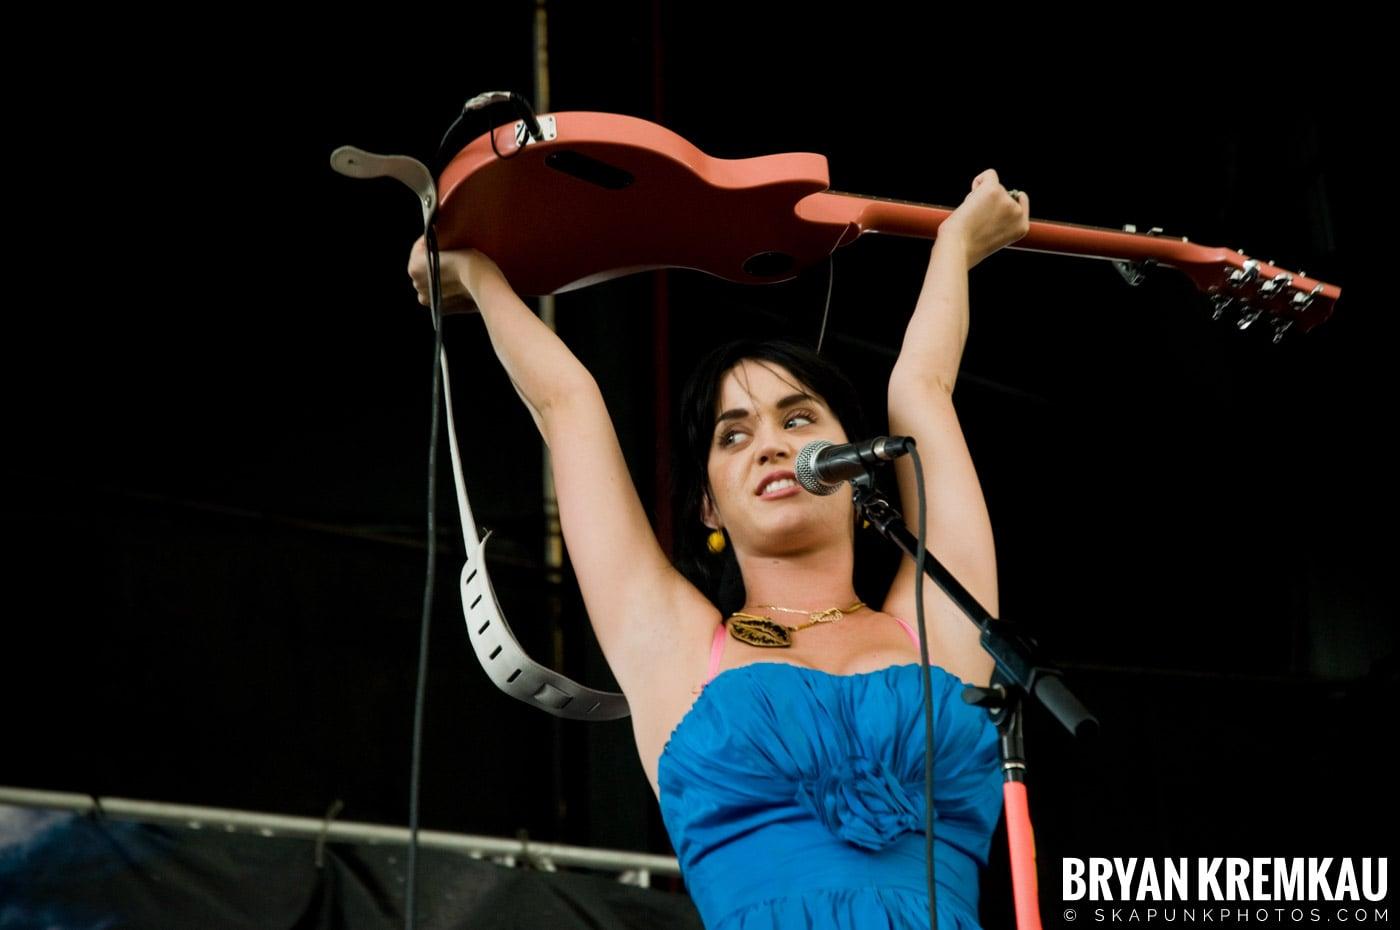 Katy Perry @ Warped Tour, Scranton PA - 7.27.08 (4)